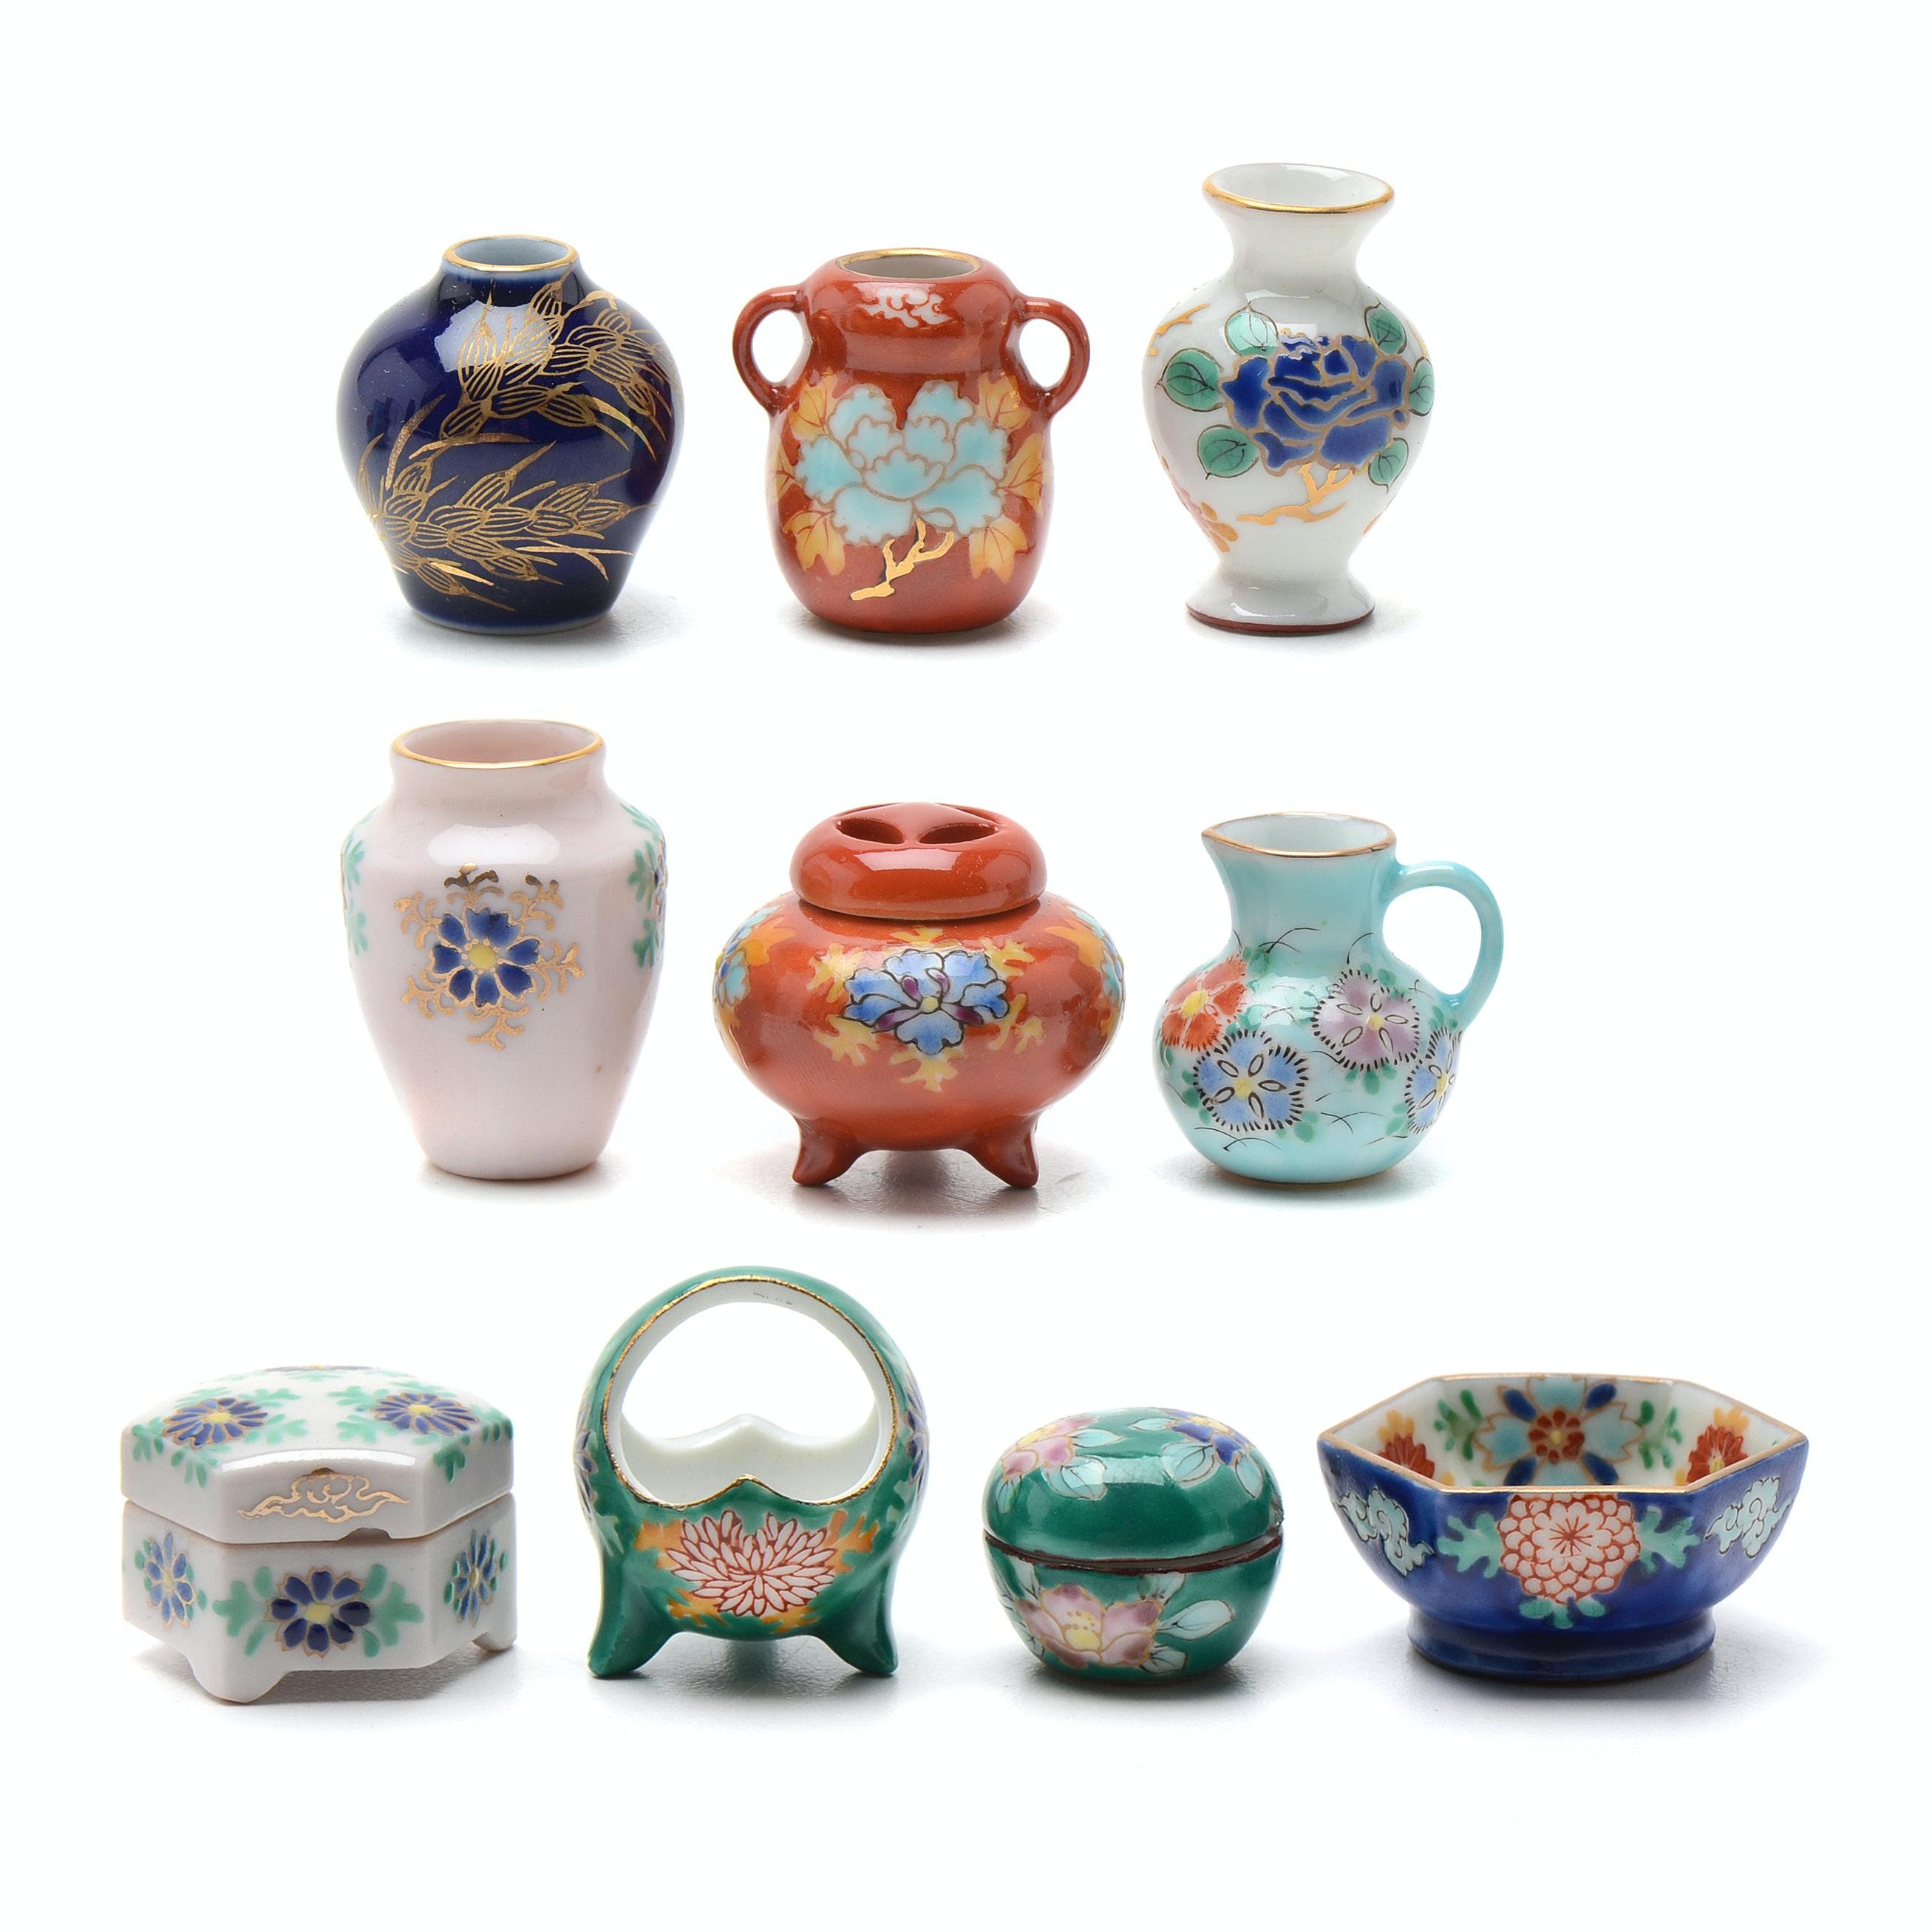 Vintage Ide Pottery Japanese Enameled Porcelain Miniature Set